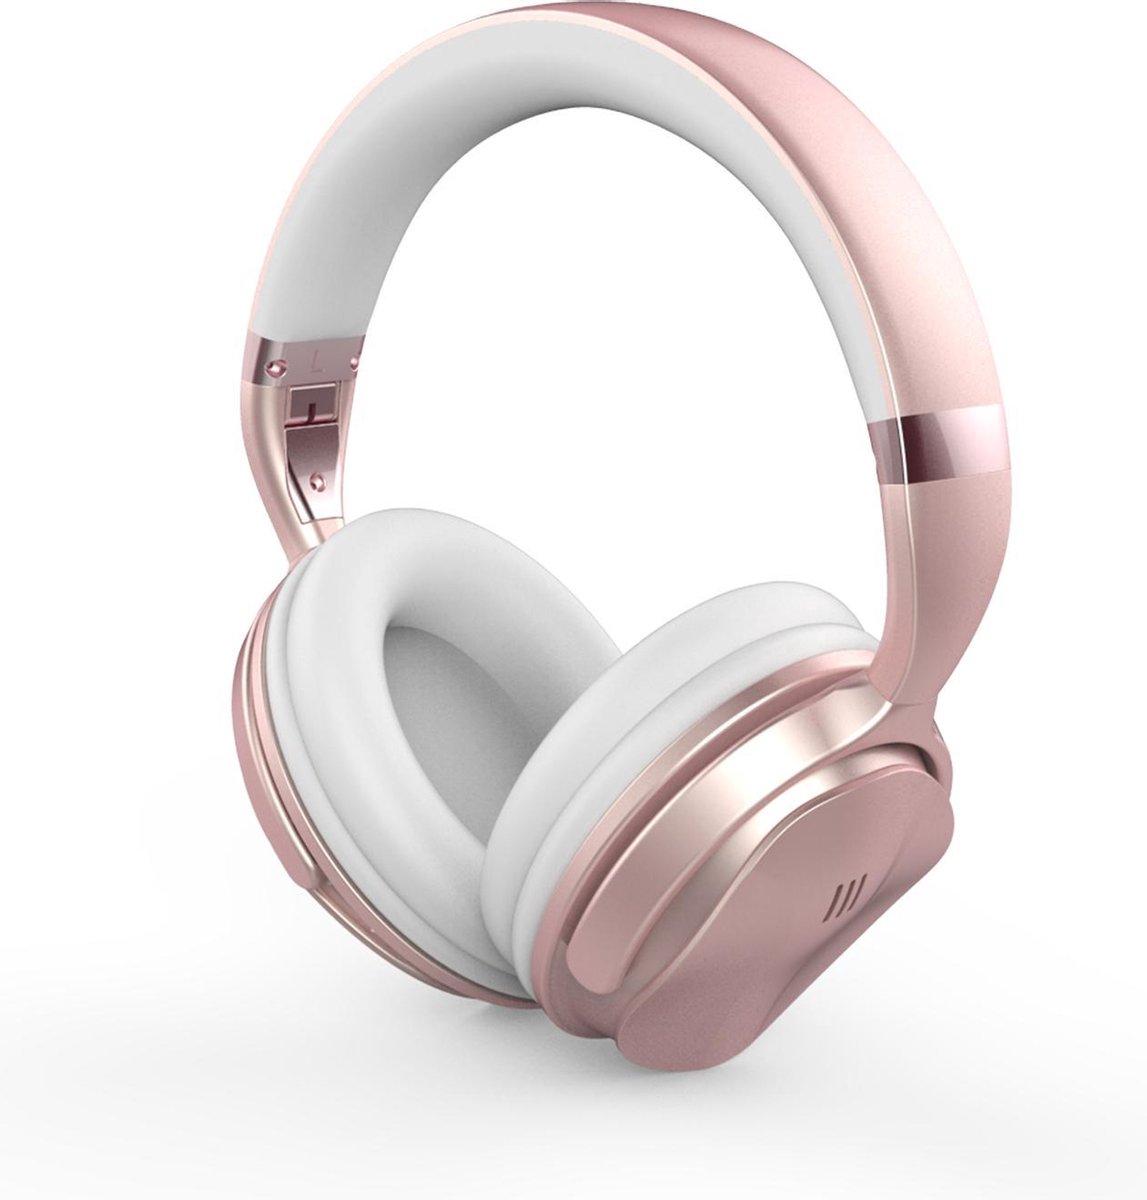 YONO Noise Cancelling Hoofdtelefoon ANC80 – Over-Ear Koptelefoon Bluetooth – Draadloos – Rose Gold